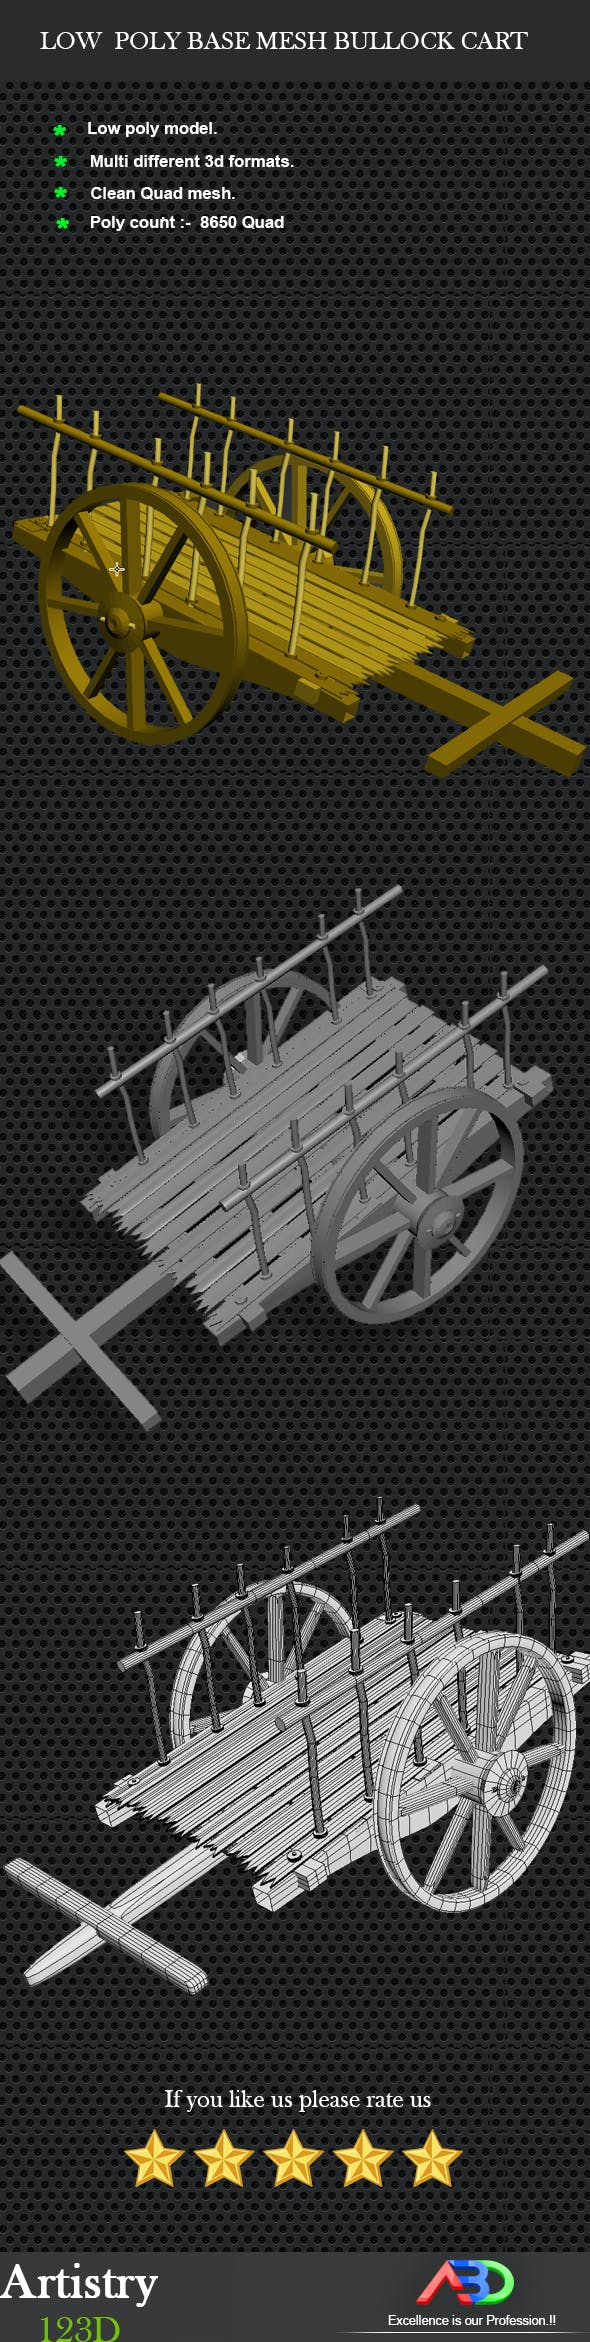 Low Poly Base Mesh Bullock cart (Cow cart) - 3DOcean Item for Sale